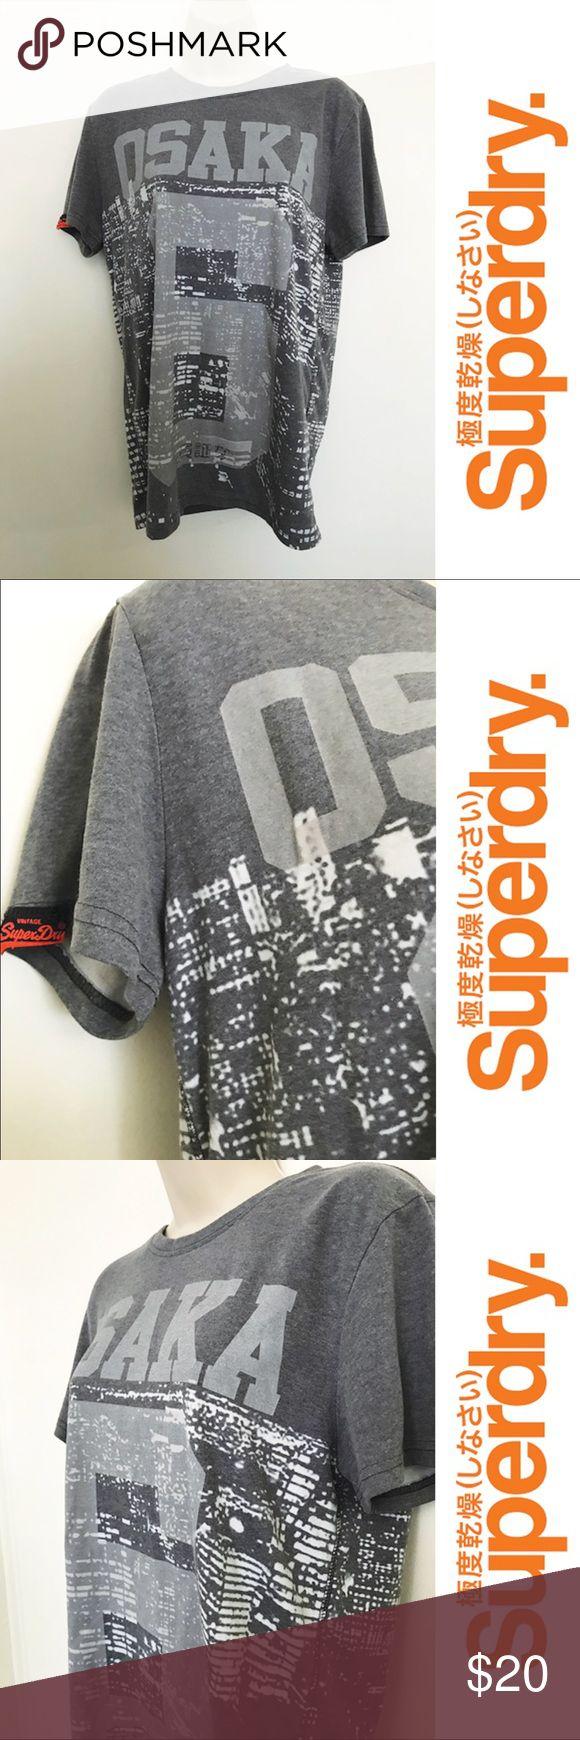 Superdry Osaka Tshirt - Medium Amazing quality Tshirt from Superdry - size medium - like new Superdry Tops